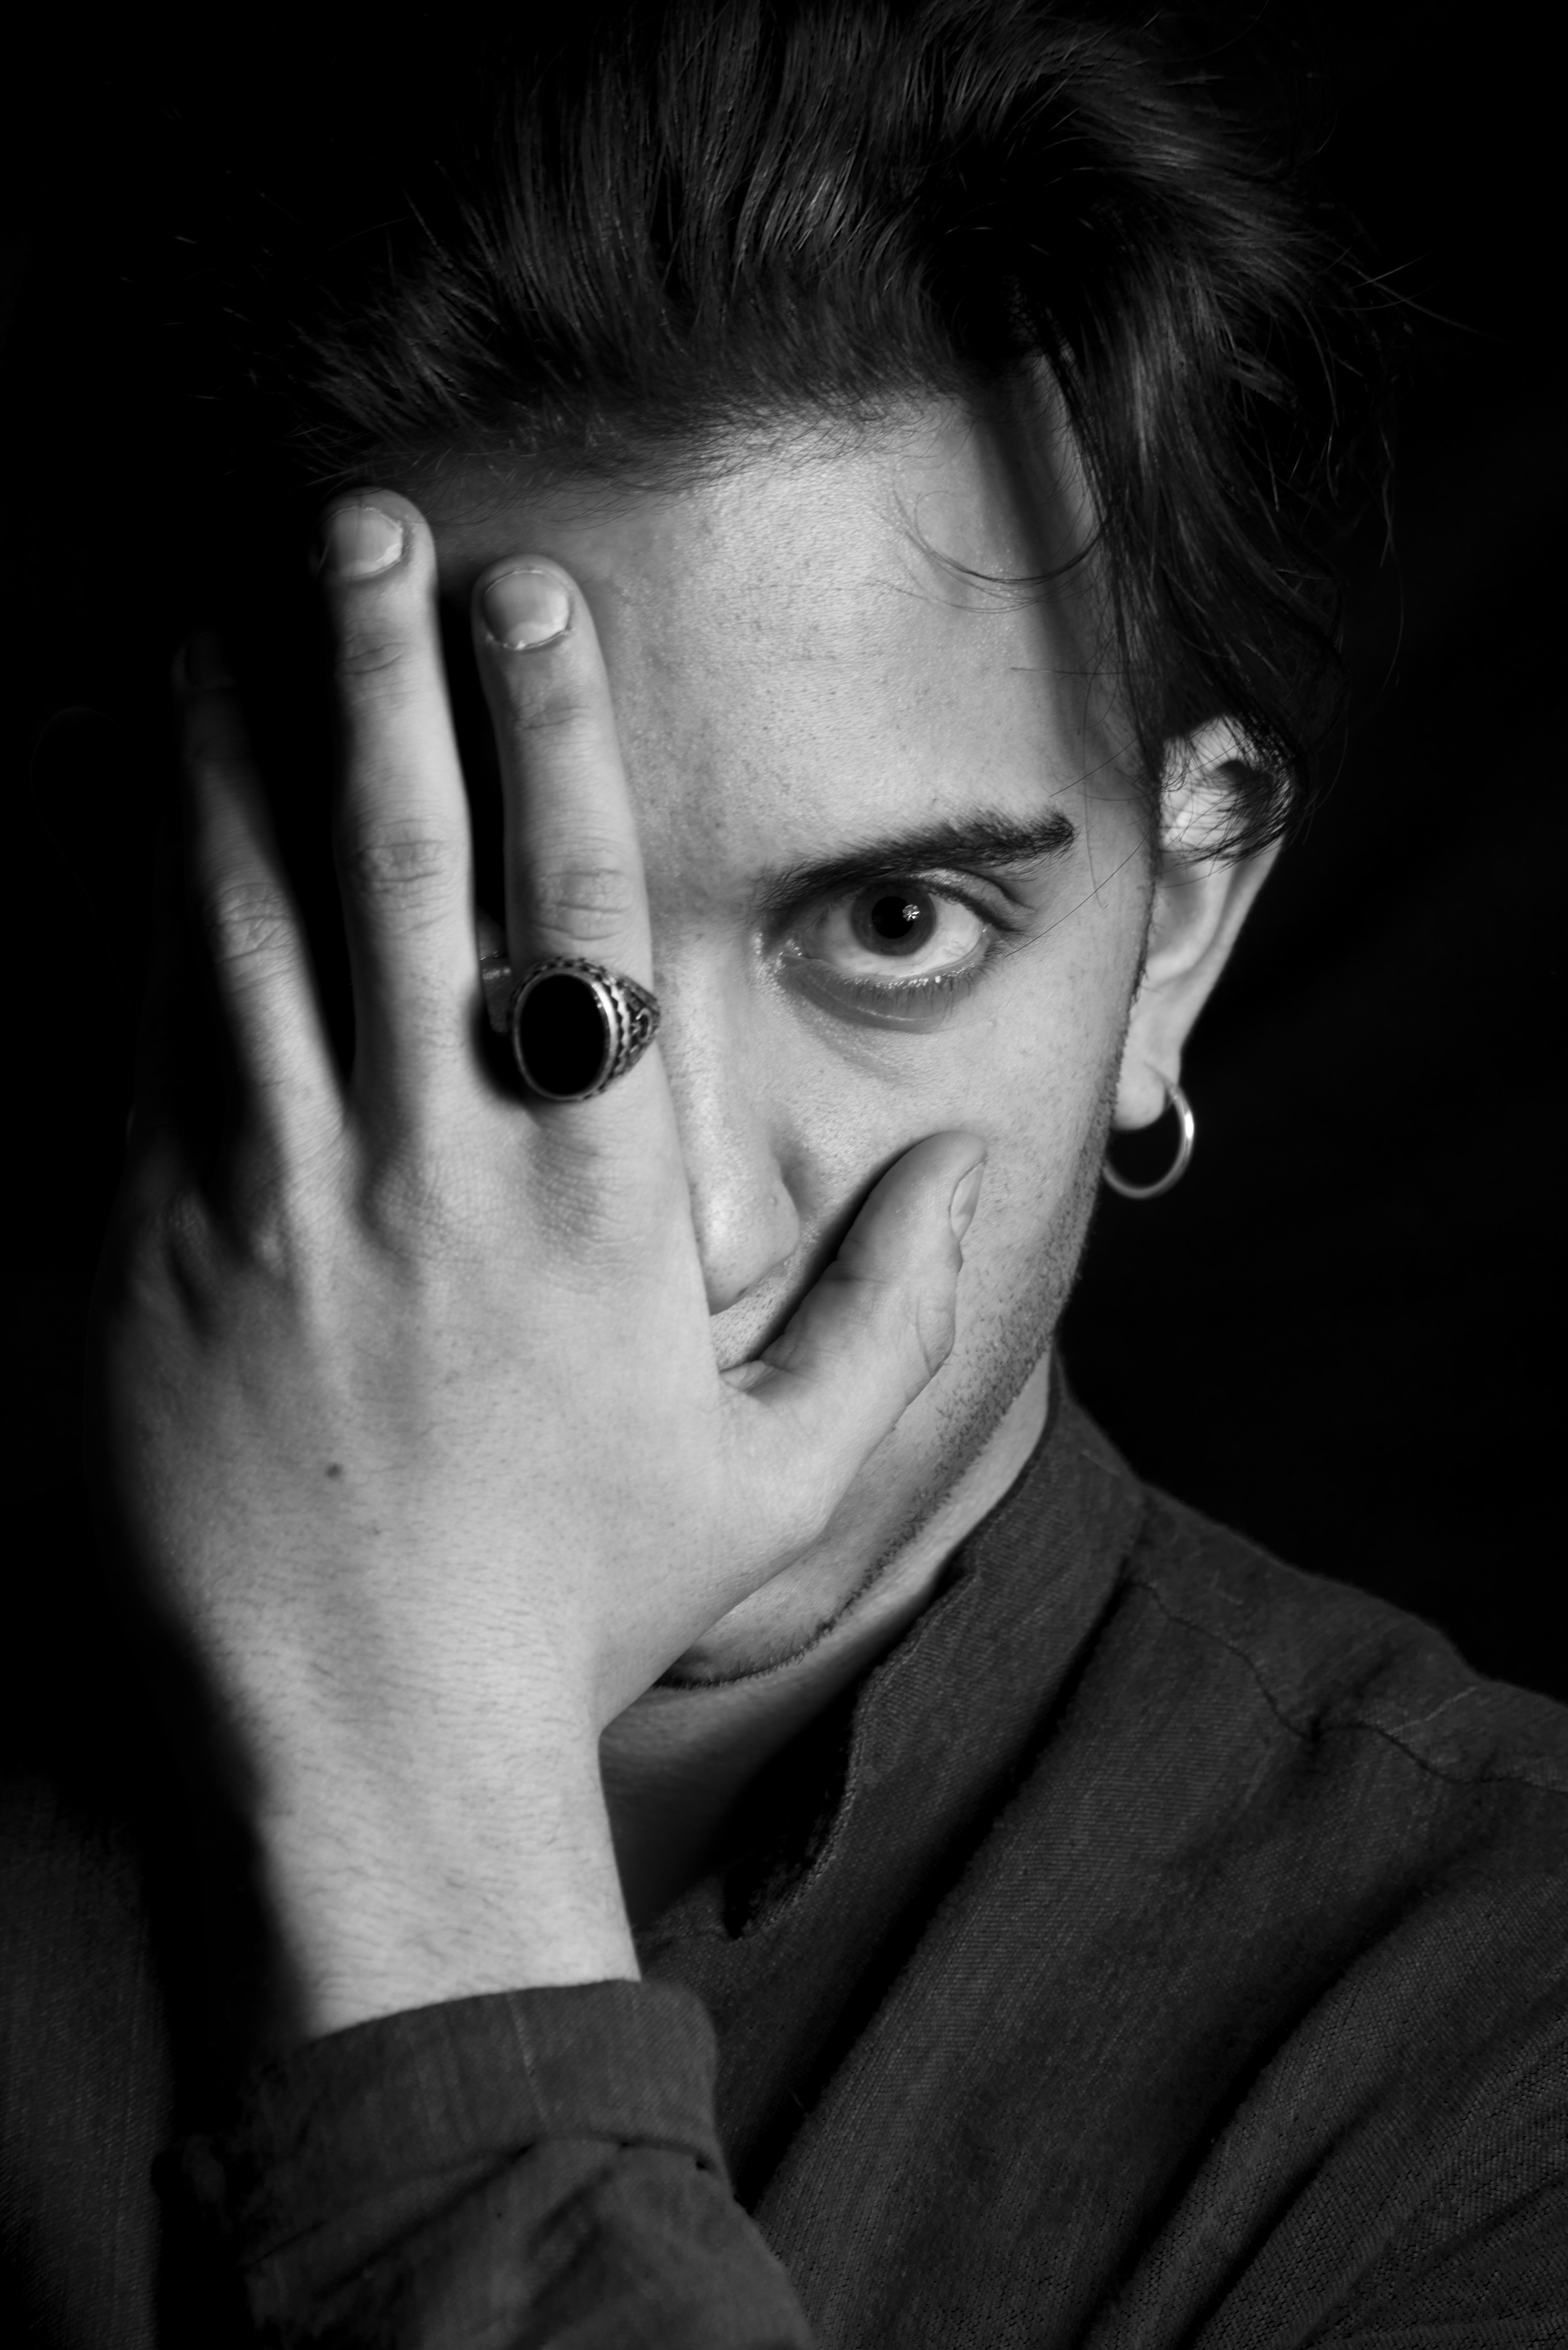 Portrait - Riccardo Pallone